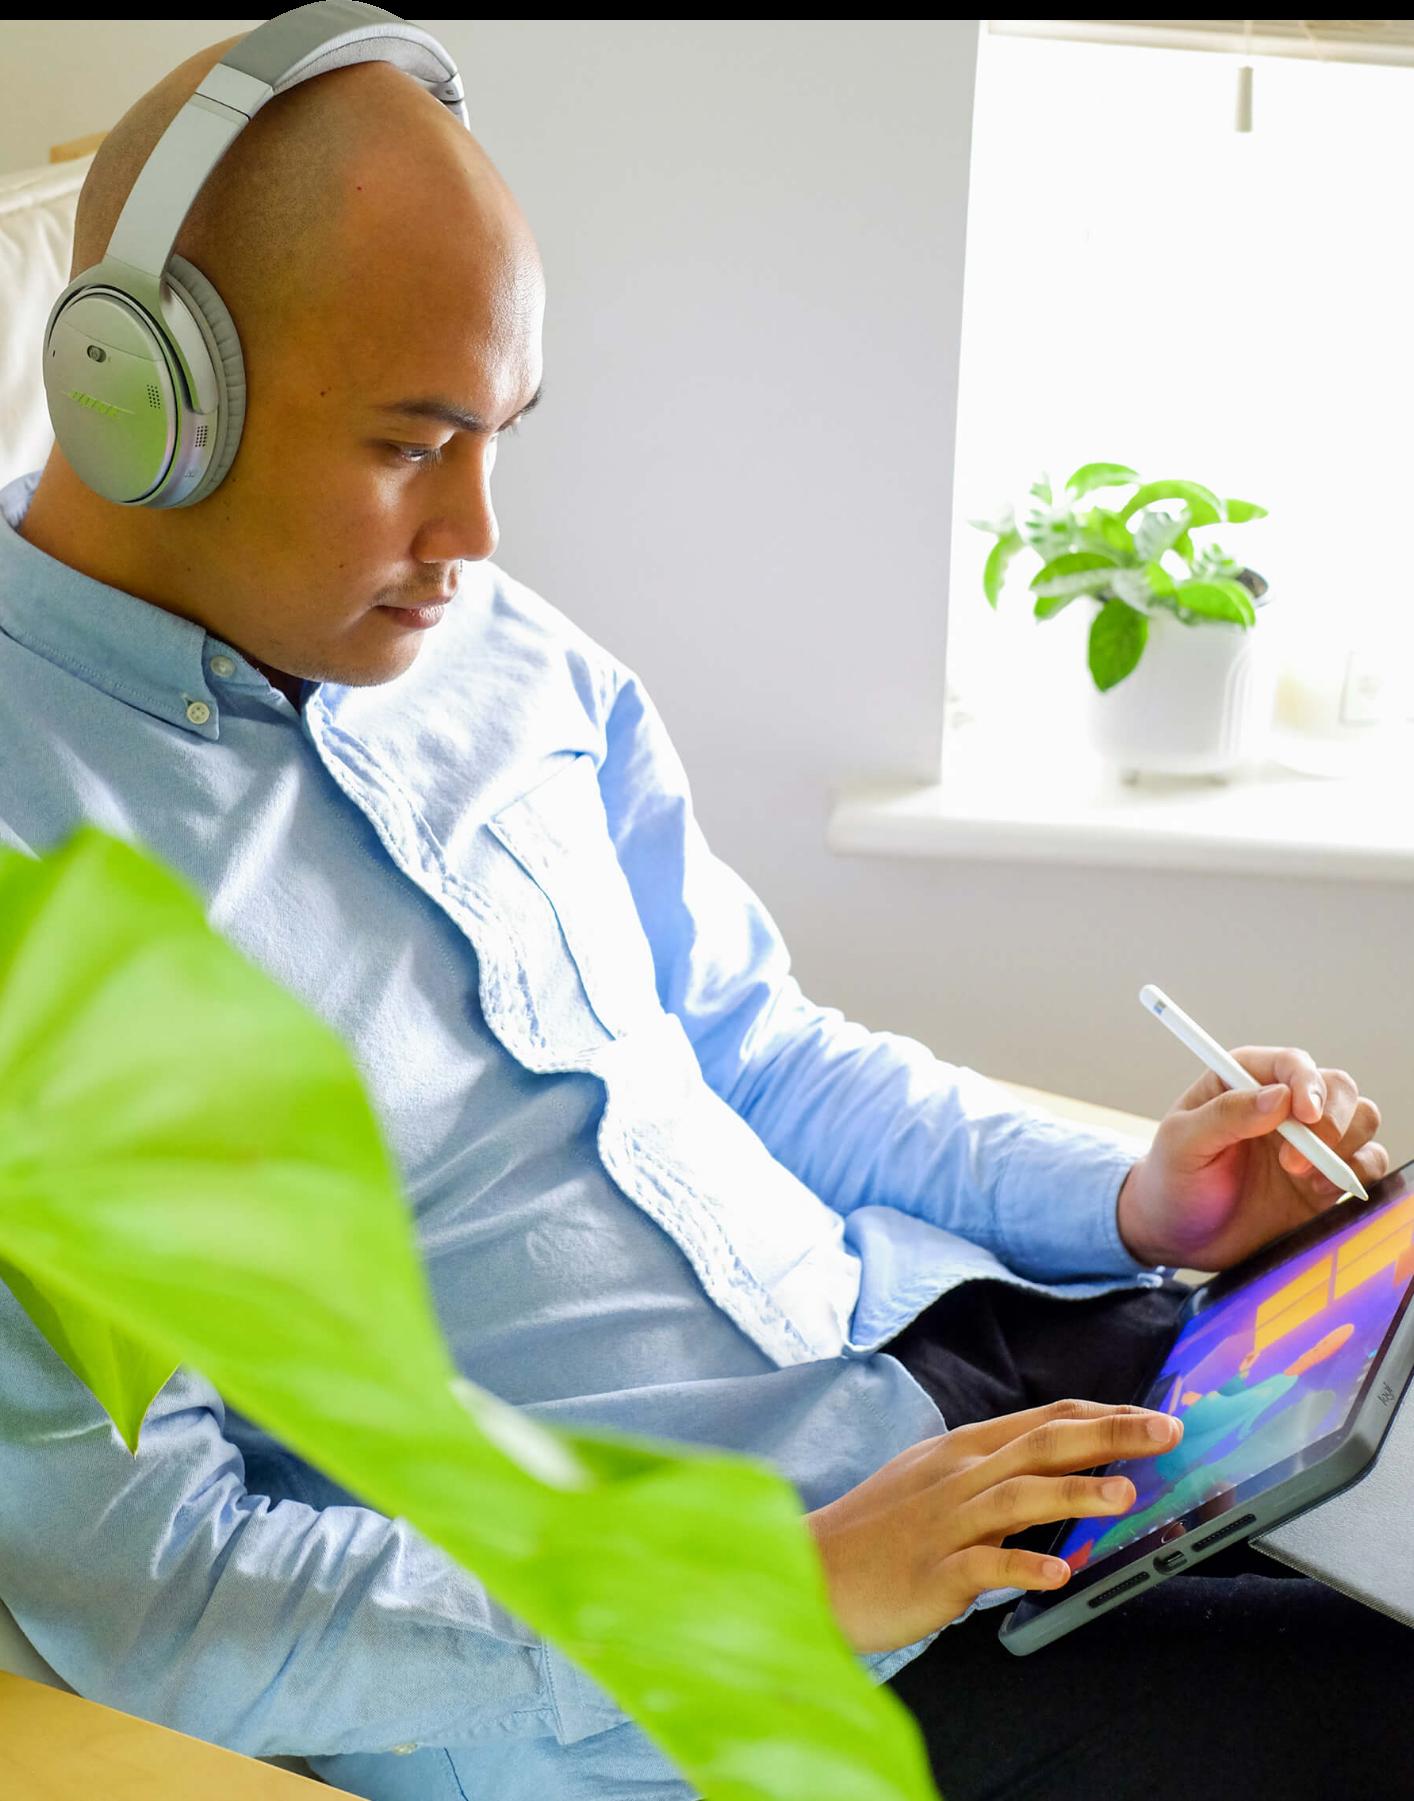 Eli wearing headphones, drawing on his iPad